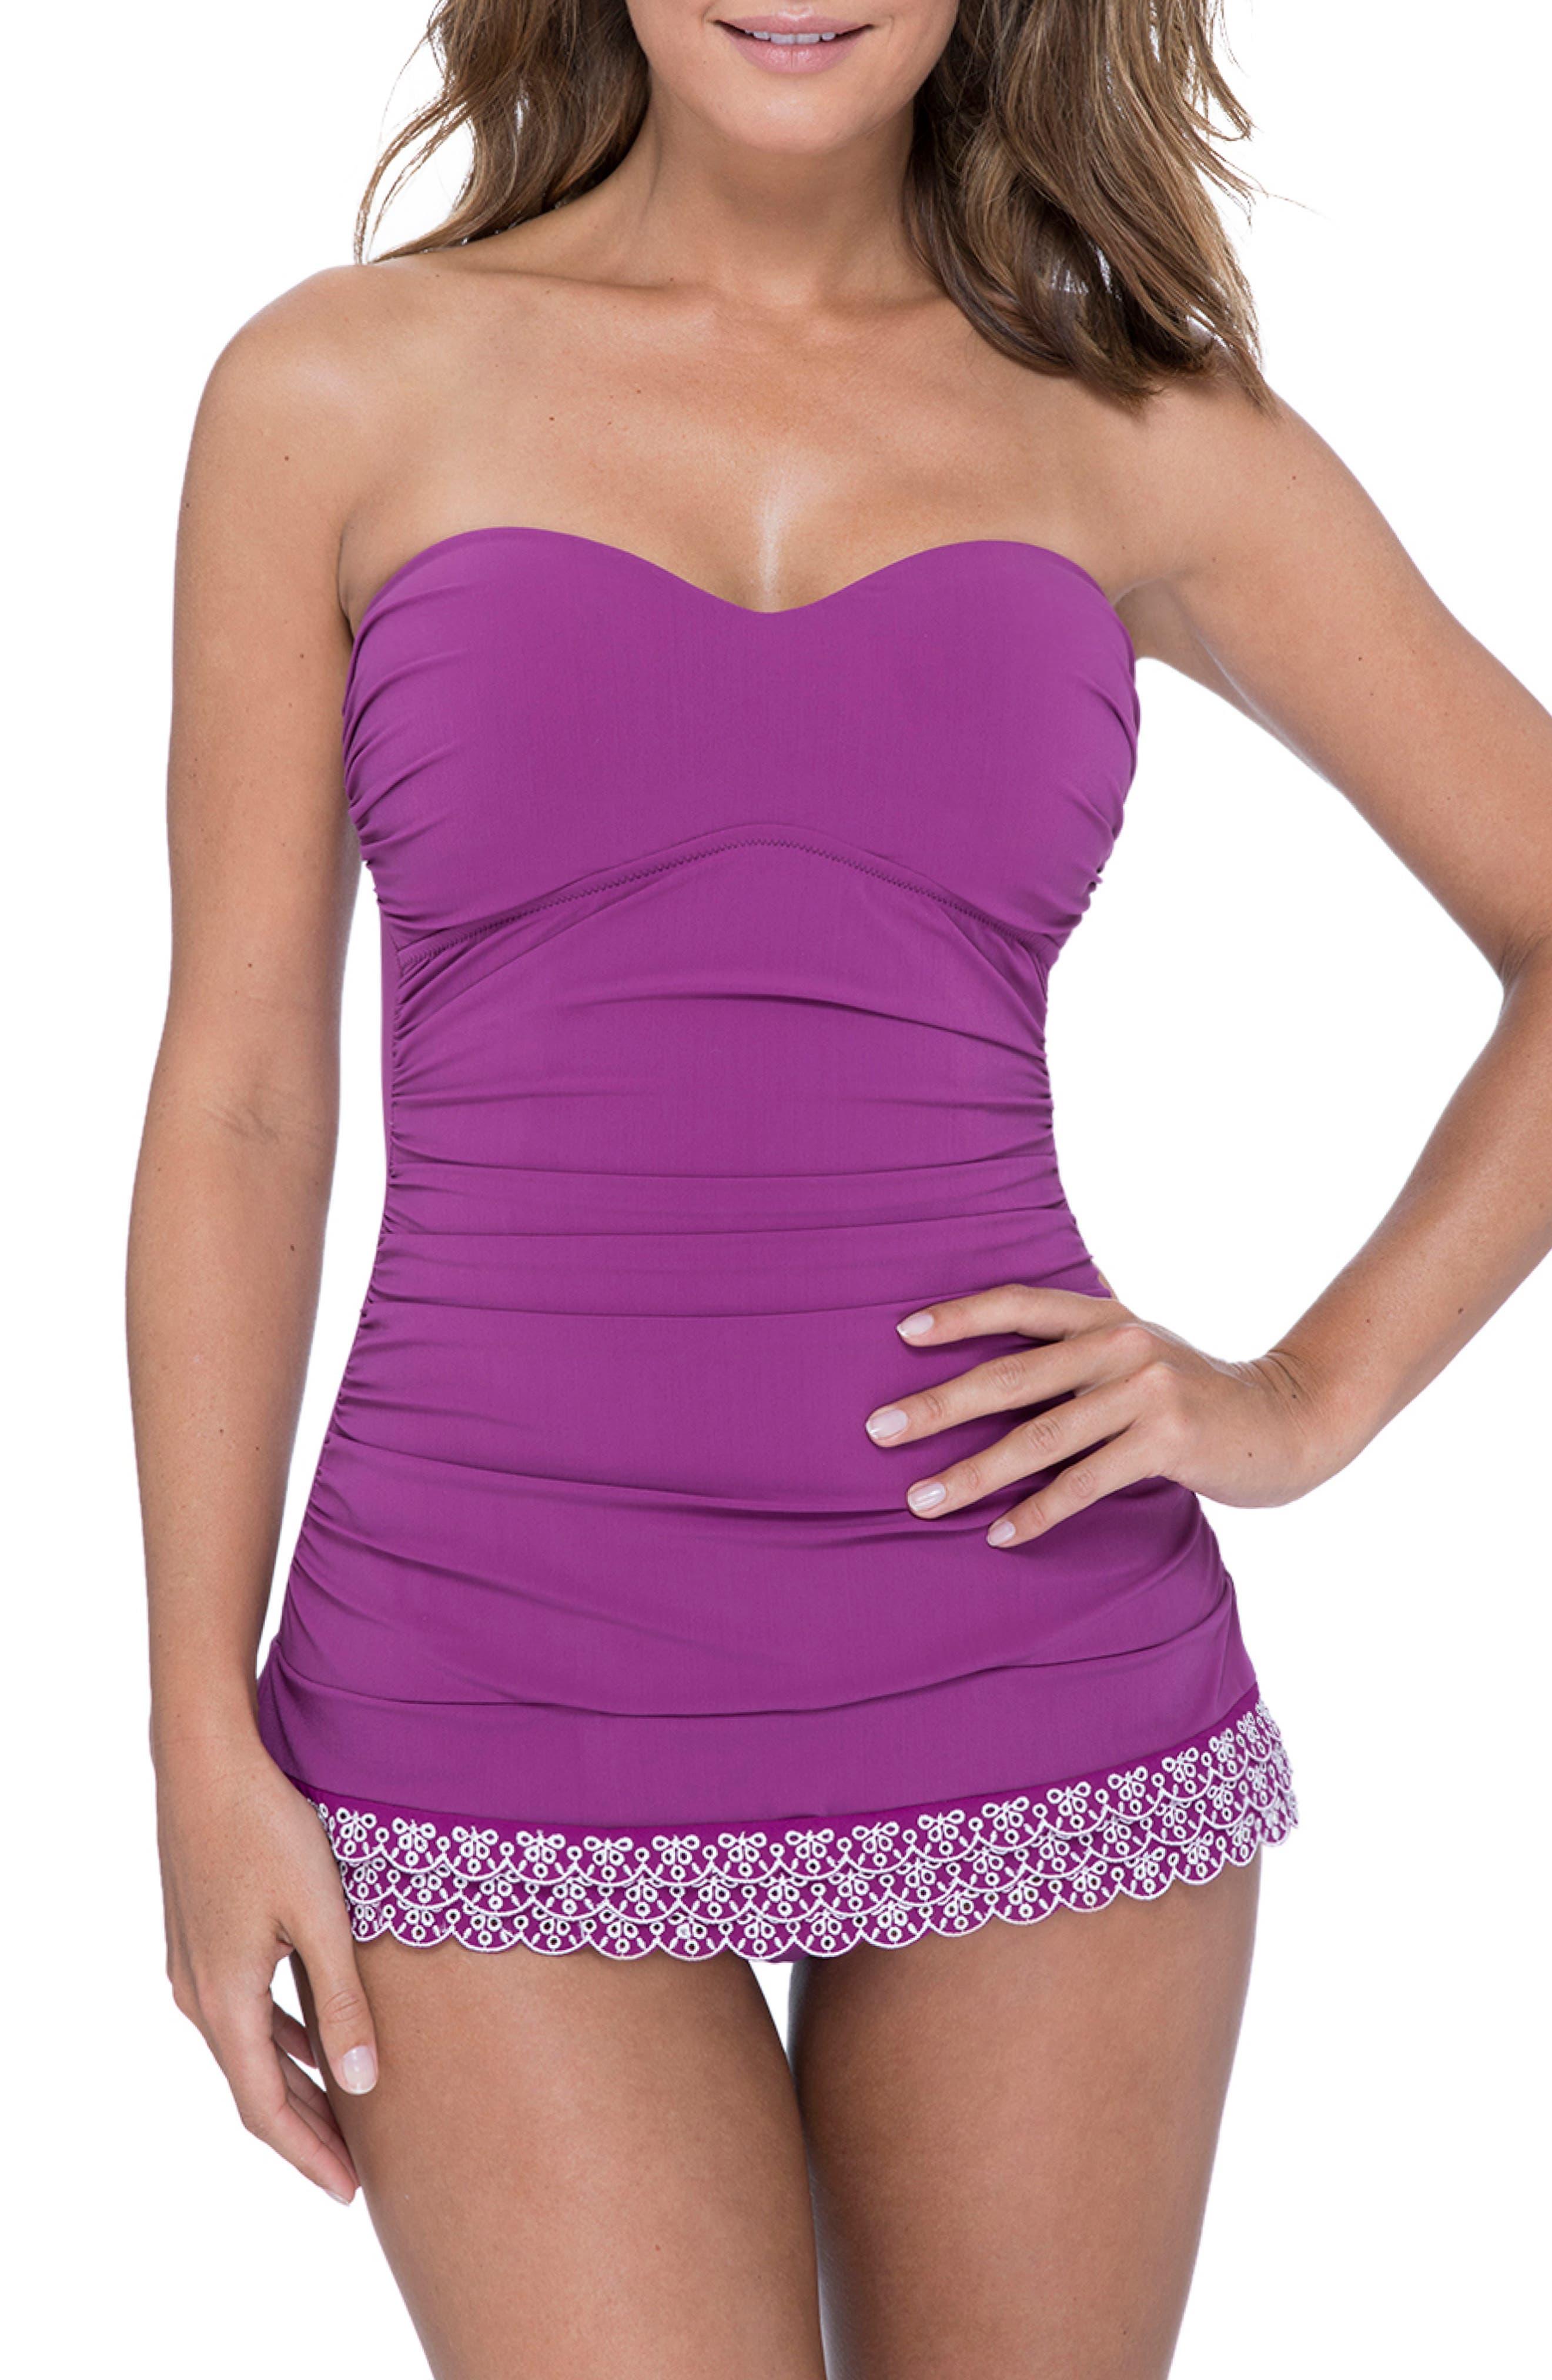 1950s Swimsuits, 50s Bathing Suits, Retro Swimwear Womens Profile By Gottex Bandeau Swim Dress Size 10 - Purple $138.00 AT vintagedancer.com